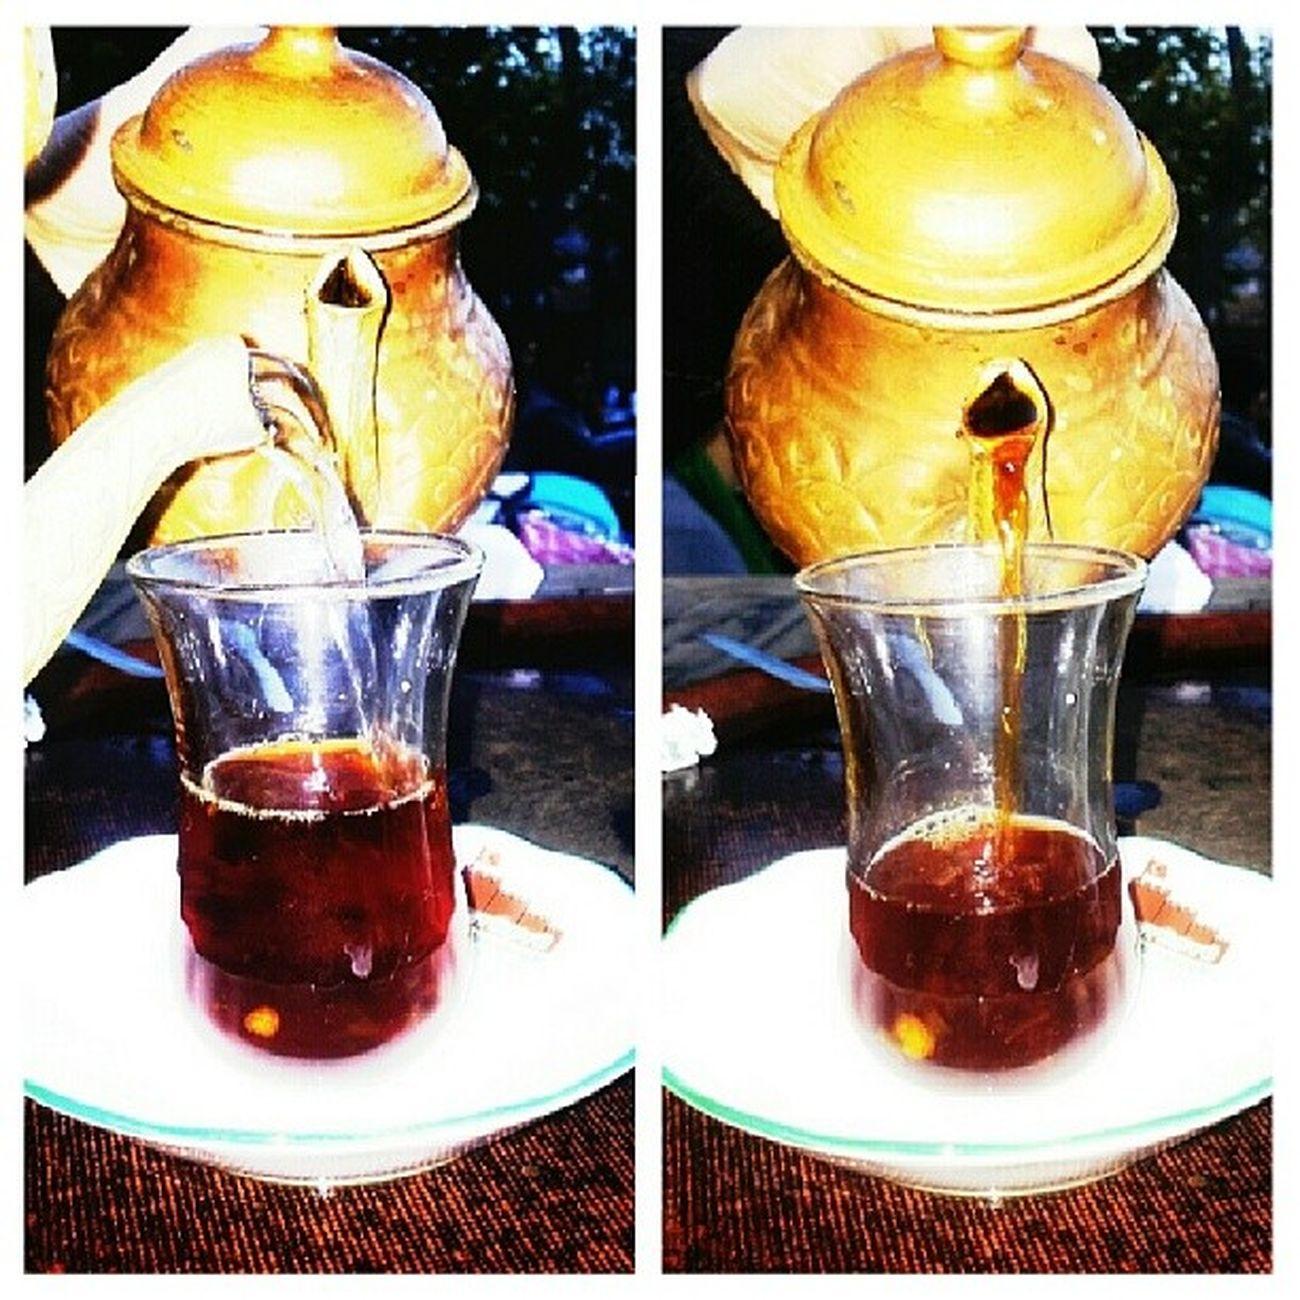 çay ımdemindeguzel Semaverde Birbaska Güzel gulhanede birpazargunu instagram instacollage autumn foto_turk photogram_tr photographers_tr